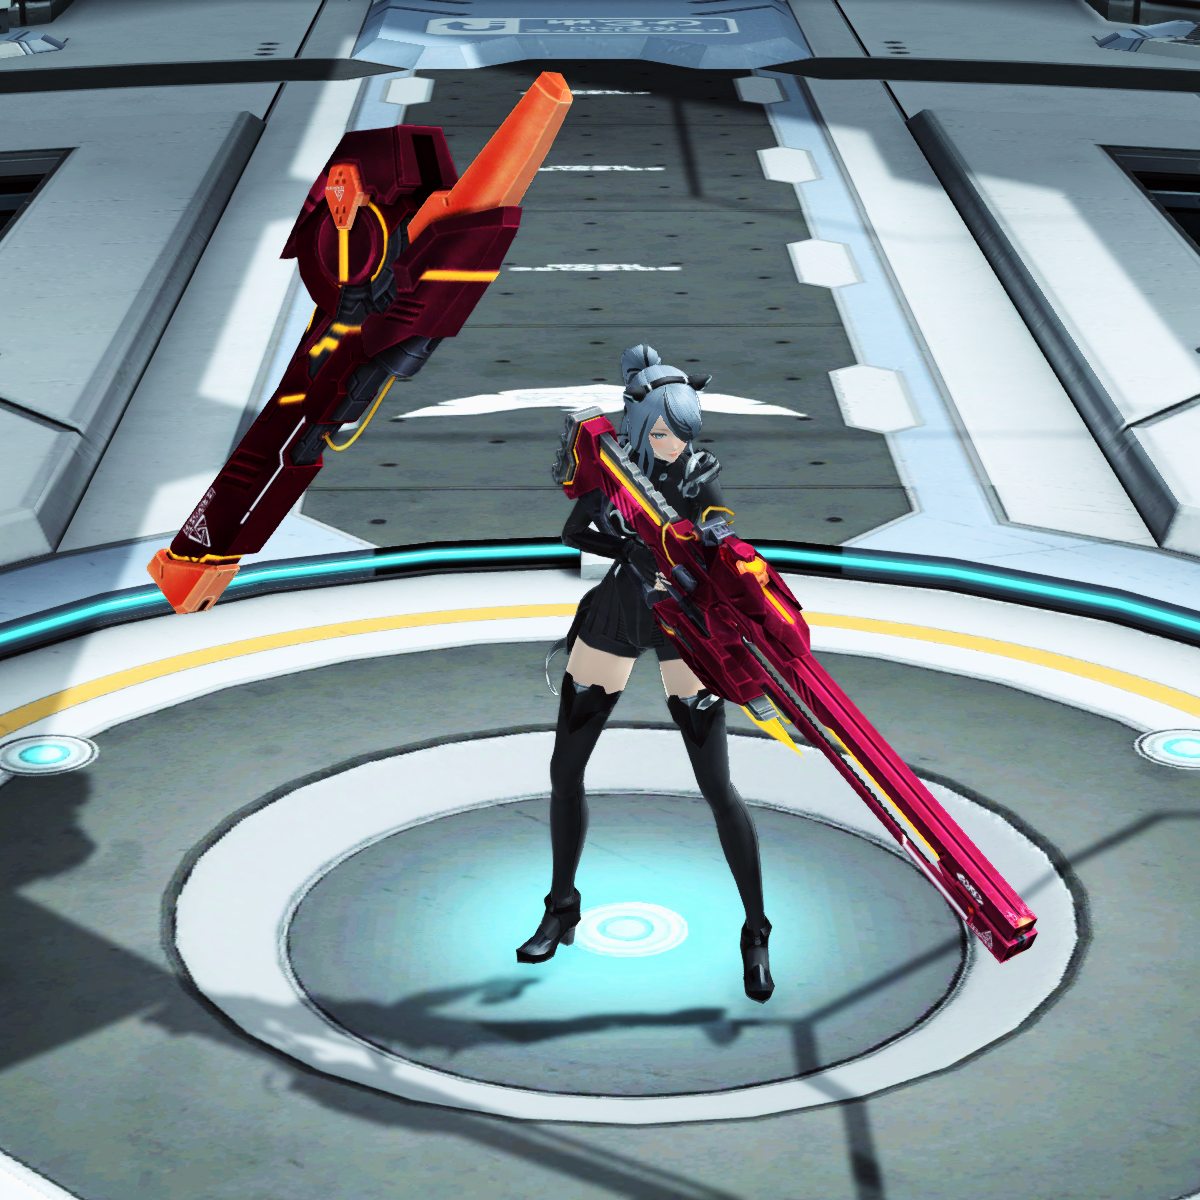 PSO2 Phantasy Star Online 2 MMORPG Sega Ilteon Dusk Megith Rifle Unsheathed